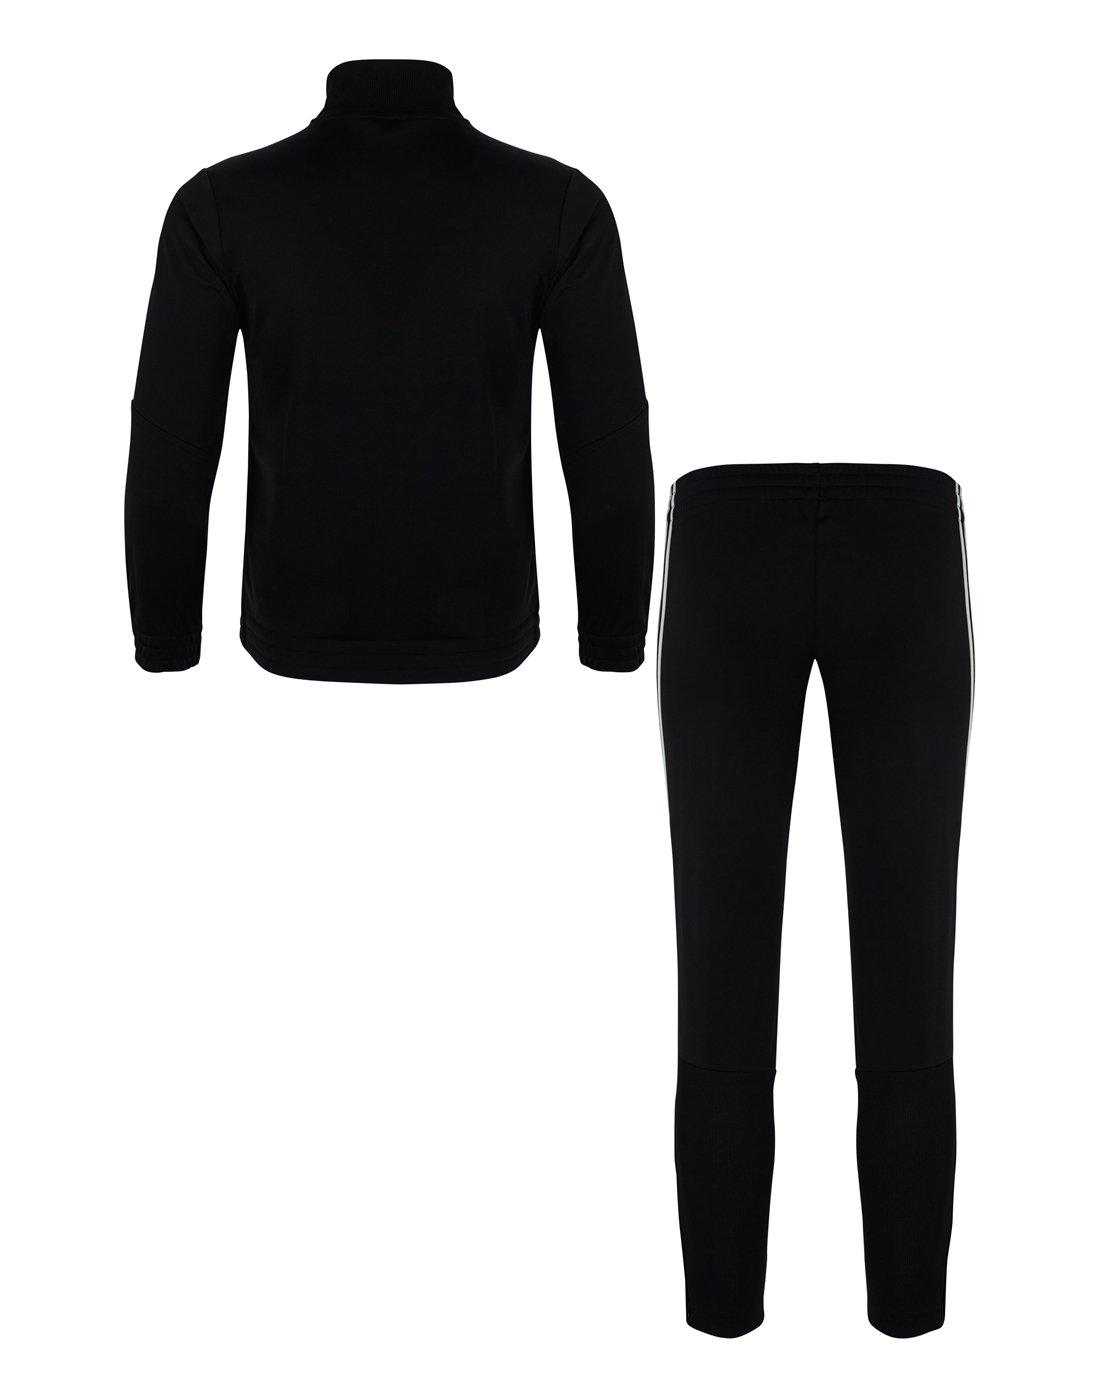 8a05873c8 Boys adidas Tiro Tracksuit   Black   Life Style Sports